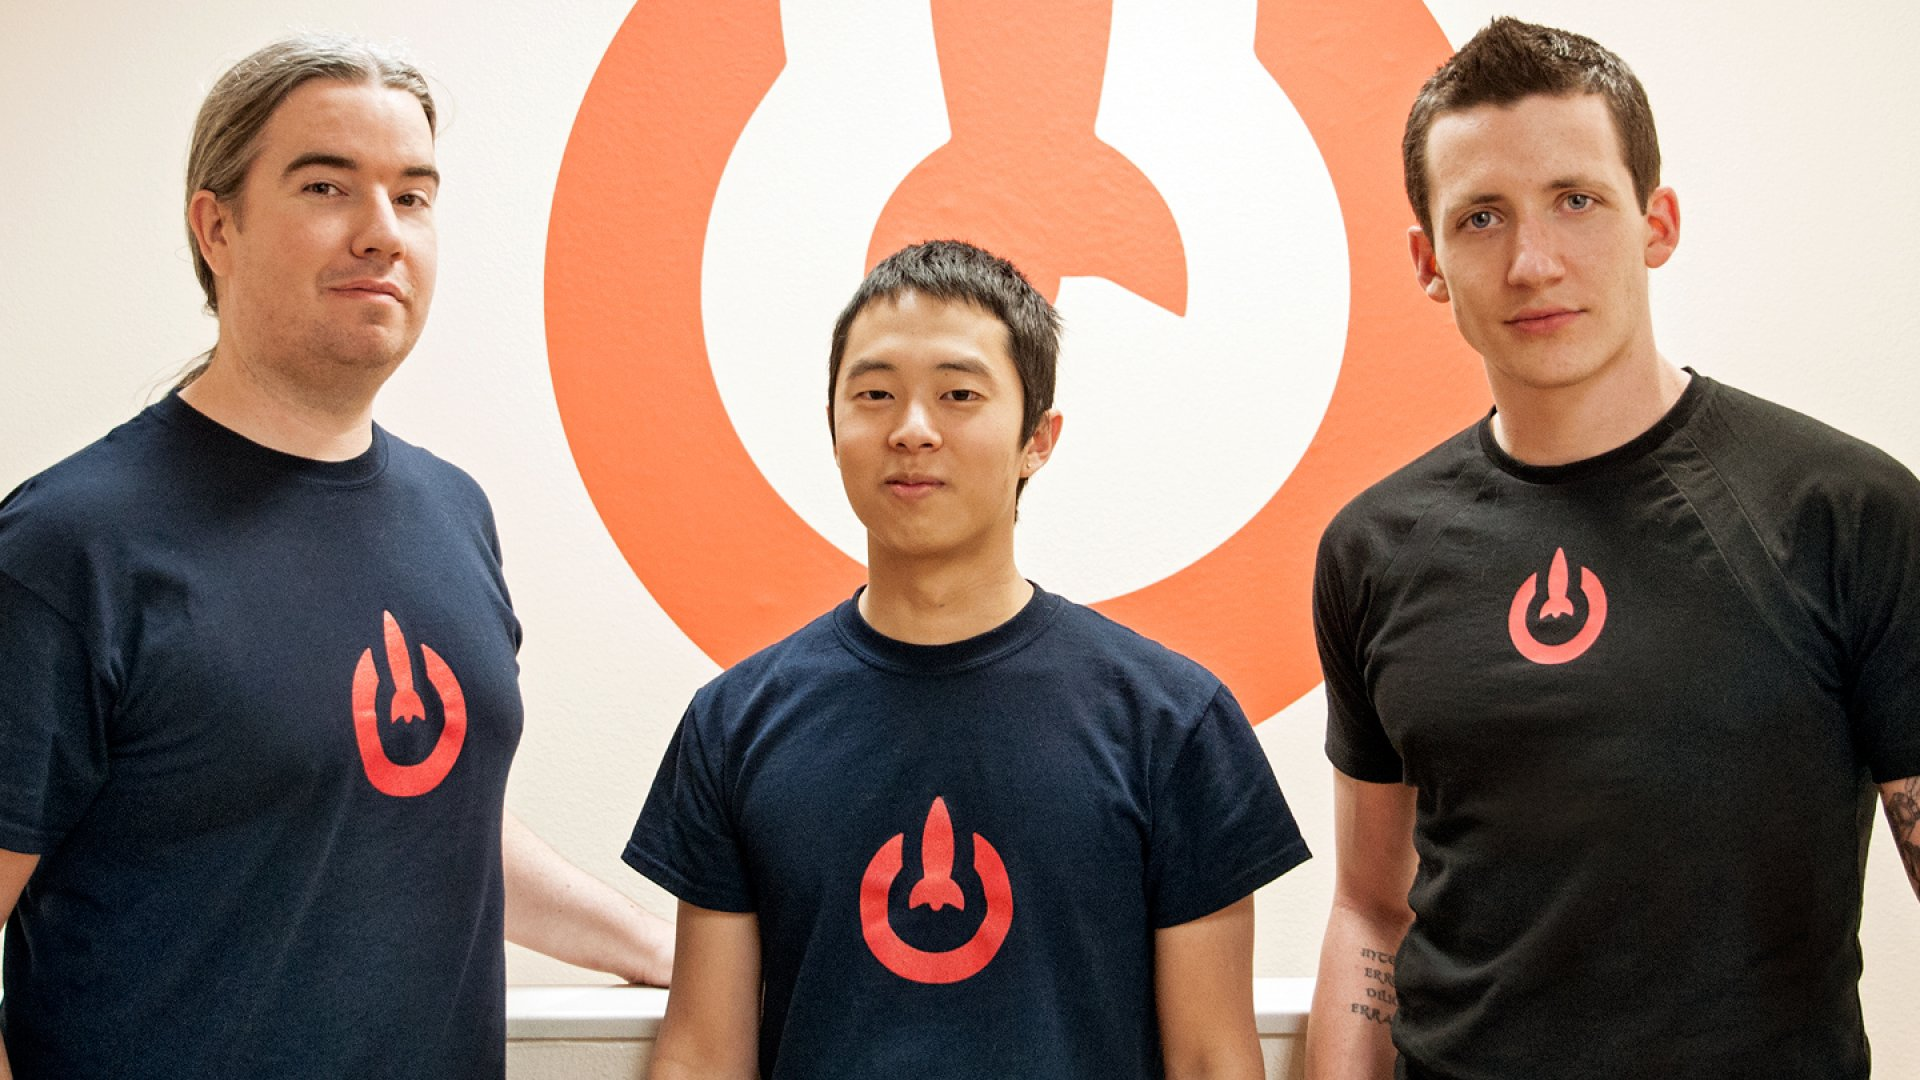 LaunchKey co-founders Devin Egan, Yo Sub Kwon and Geoff Sanders.